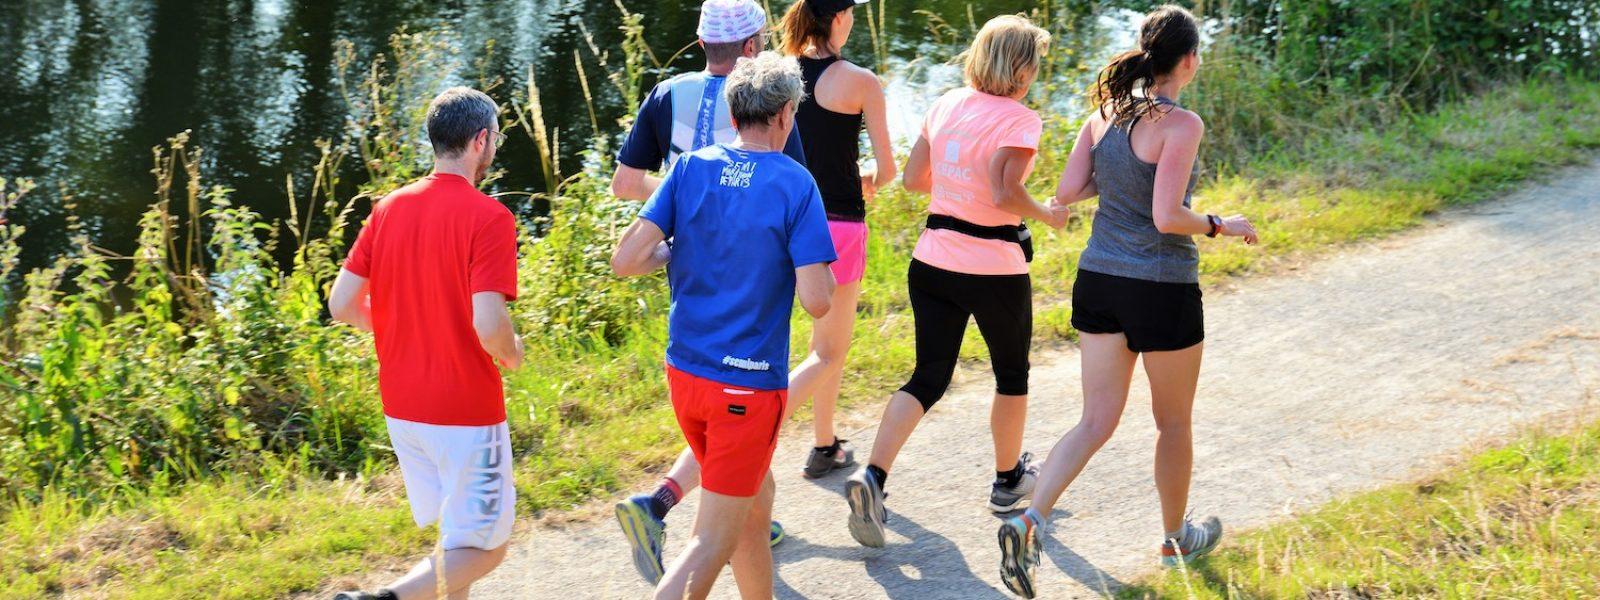 Où faire du running à Rennes ?